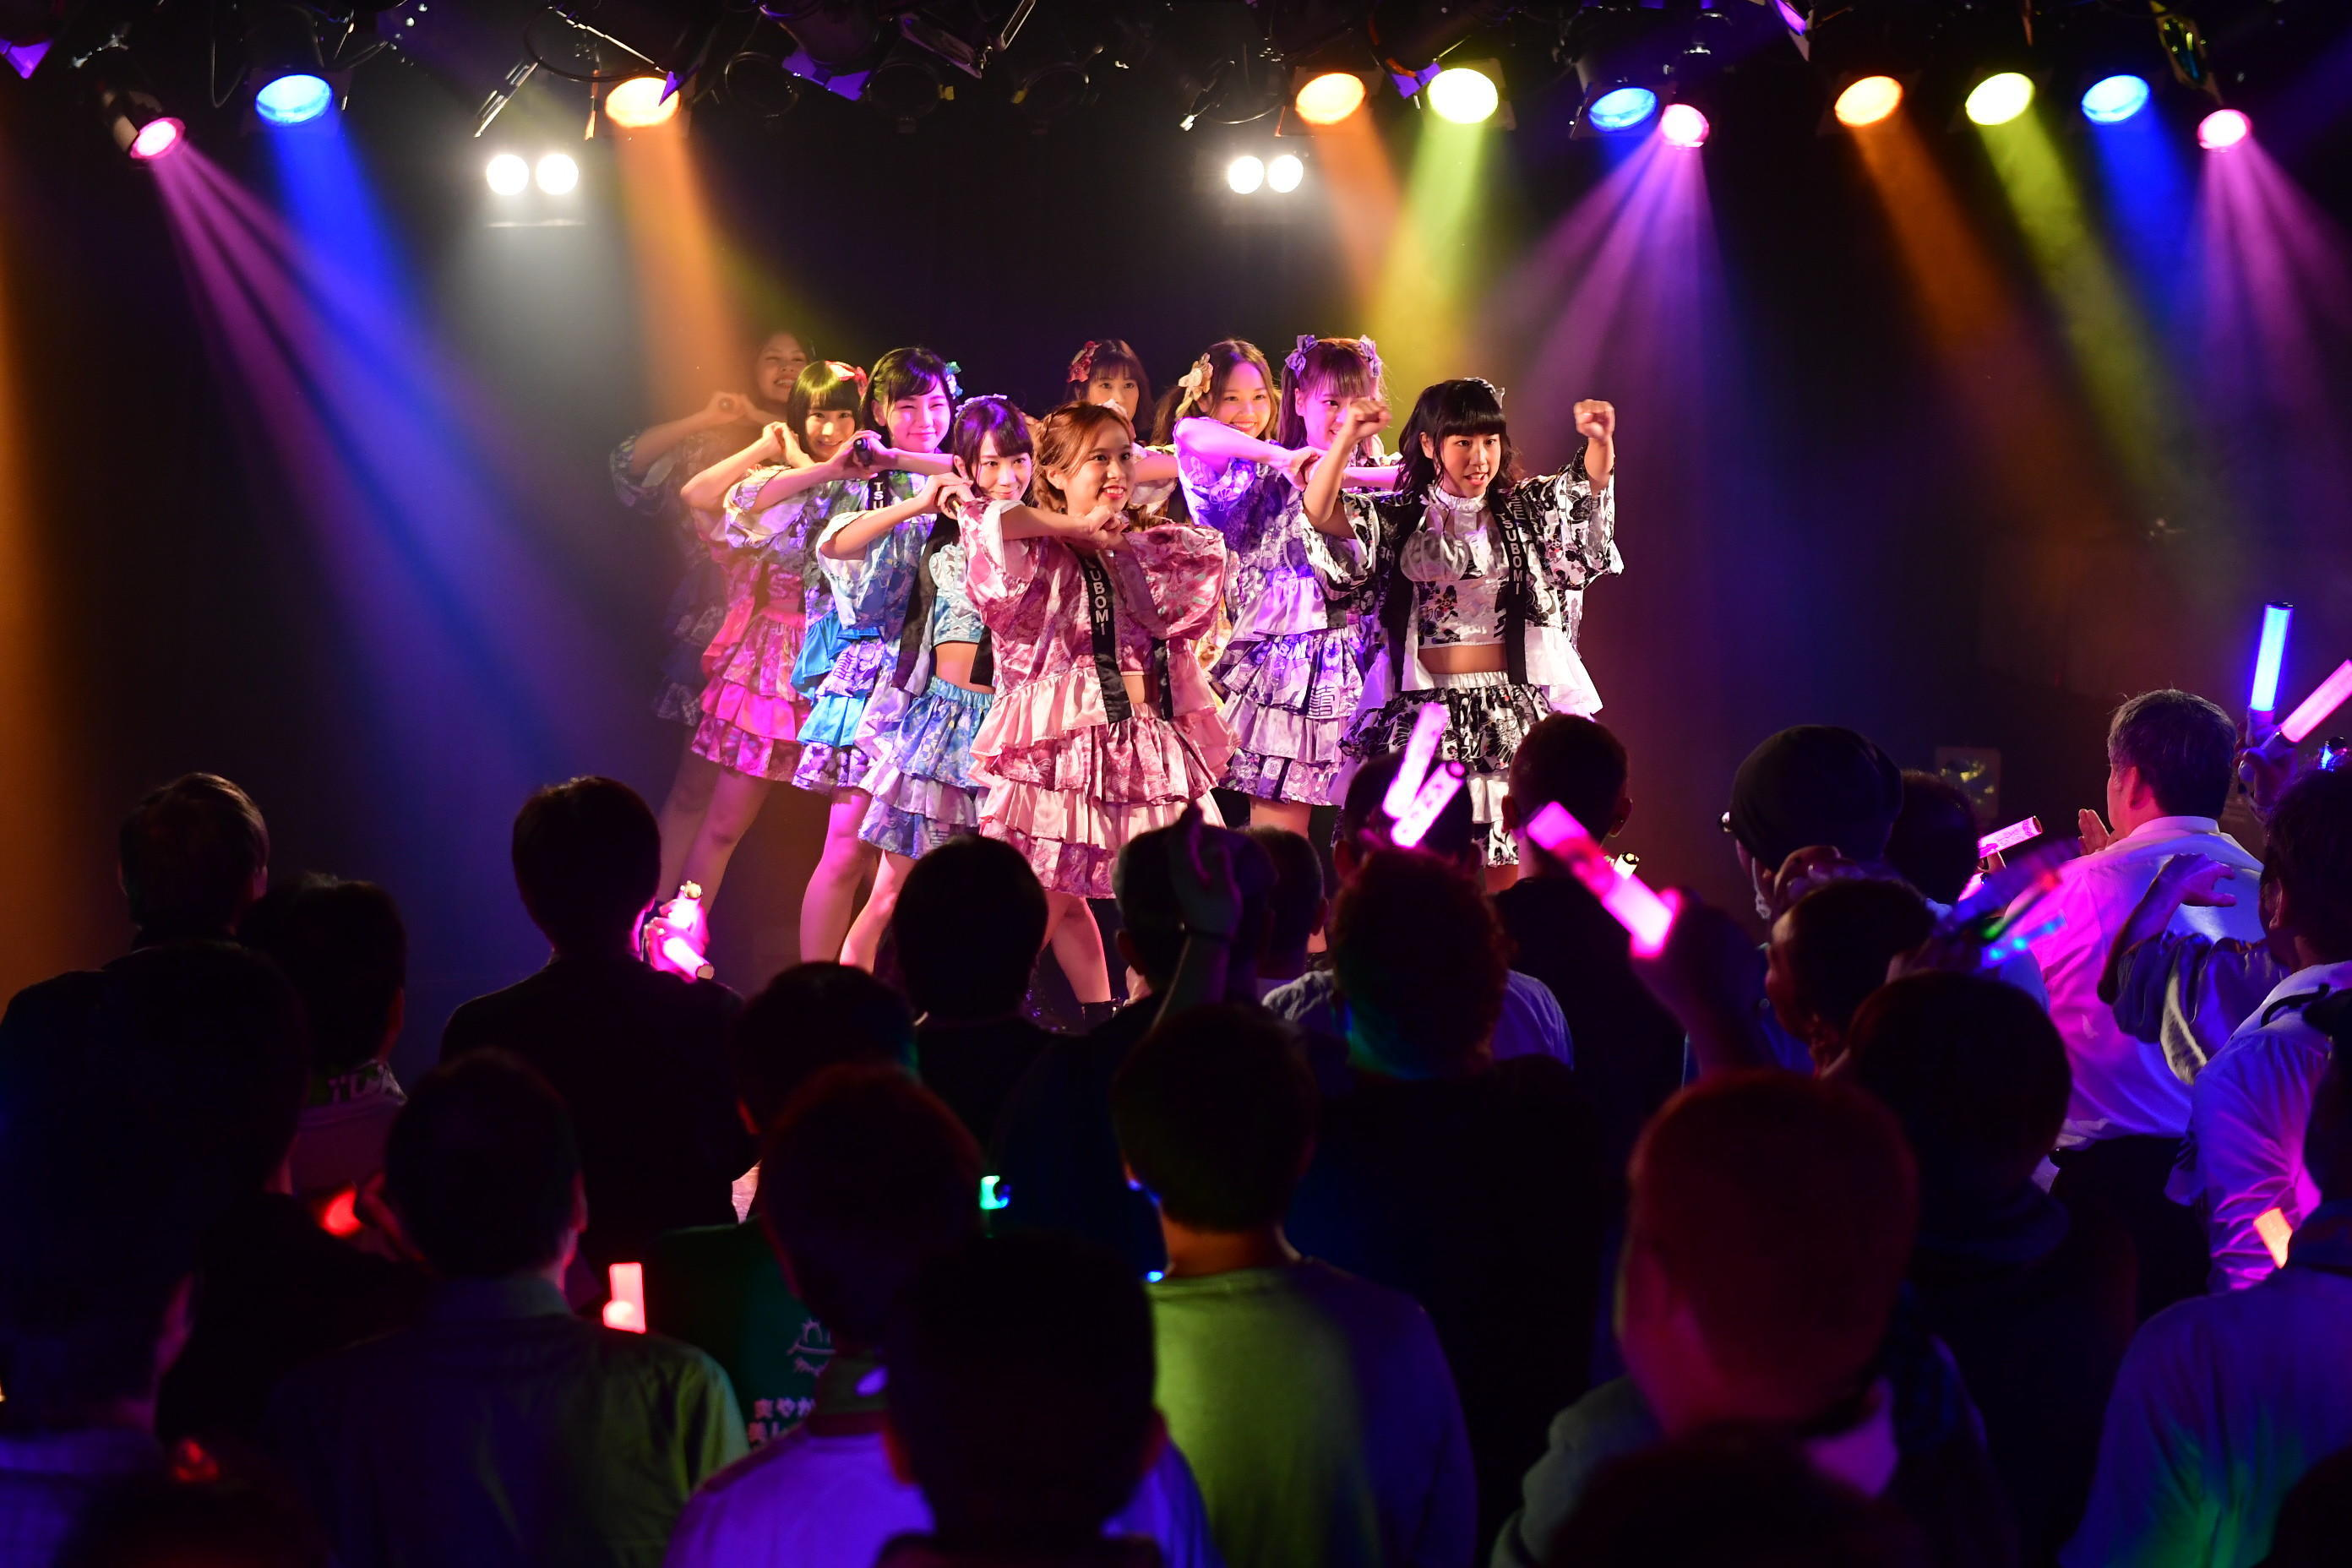 http://news.yoshimoto.co.jp/20181108182325-5eea7240c3be78bf16f9293fe3000895fd18490b.jpg